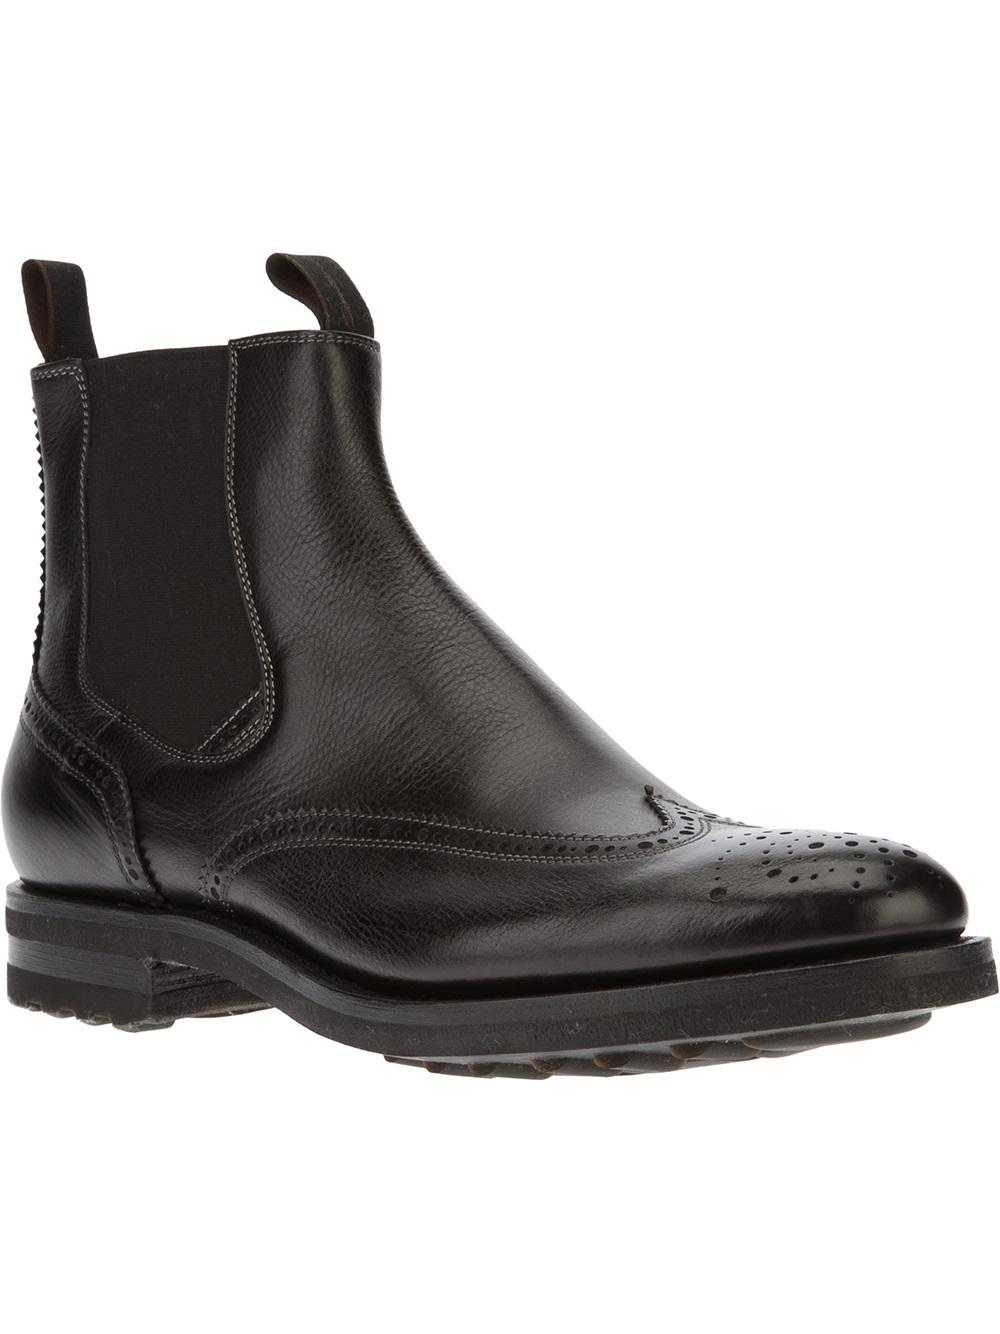 santoni brogue chelsea boot in black for men lyst. Black Bedroom Furniture Sets. Home Design Ideas